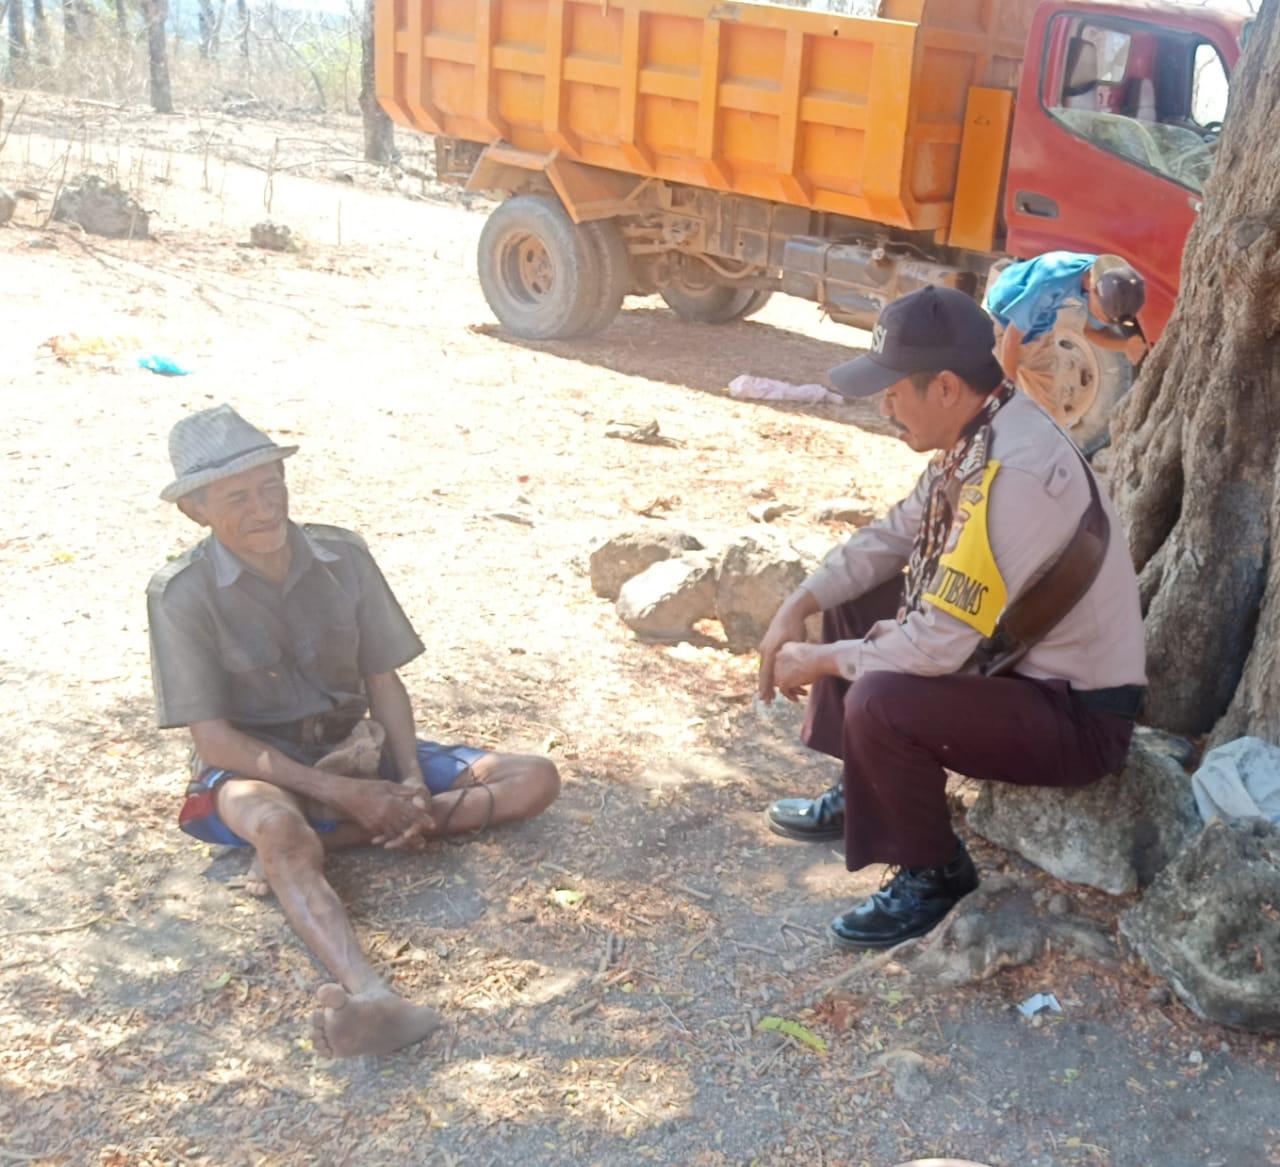 Sambangi Warga, Bhabinkamtibmas Polsek Rote Barat Laut Berikan Himbauan Kamtibmas